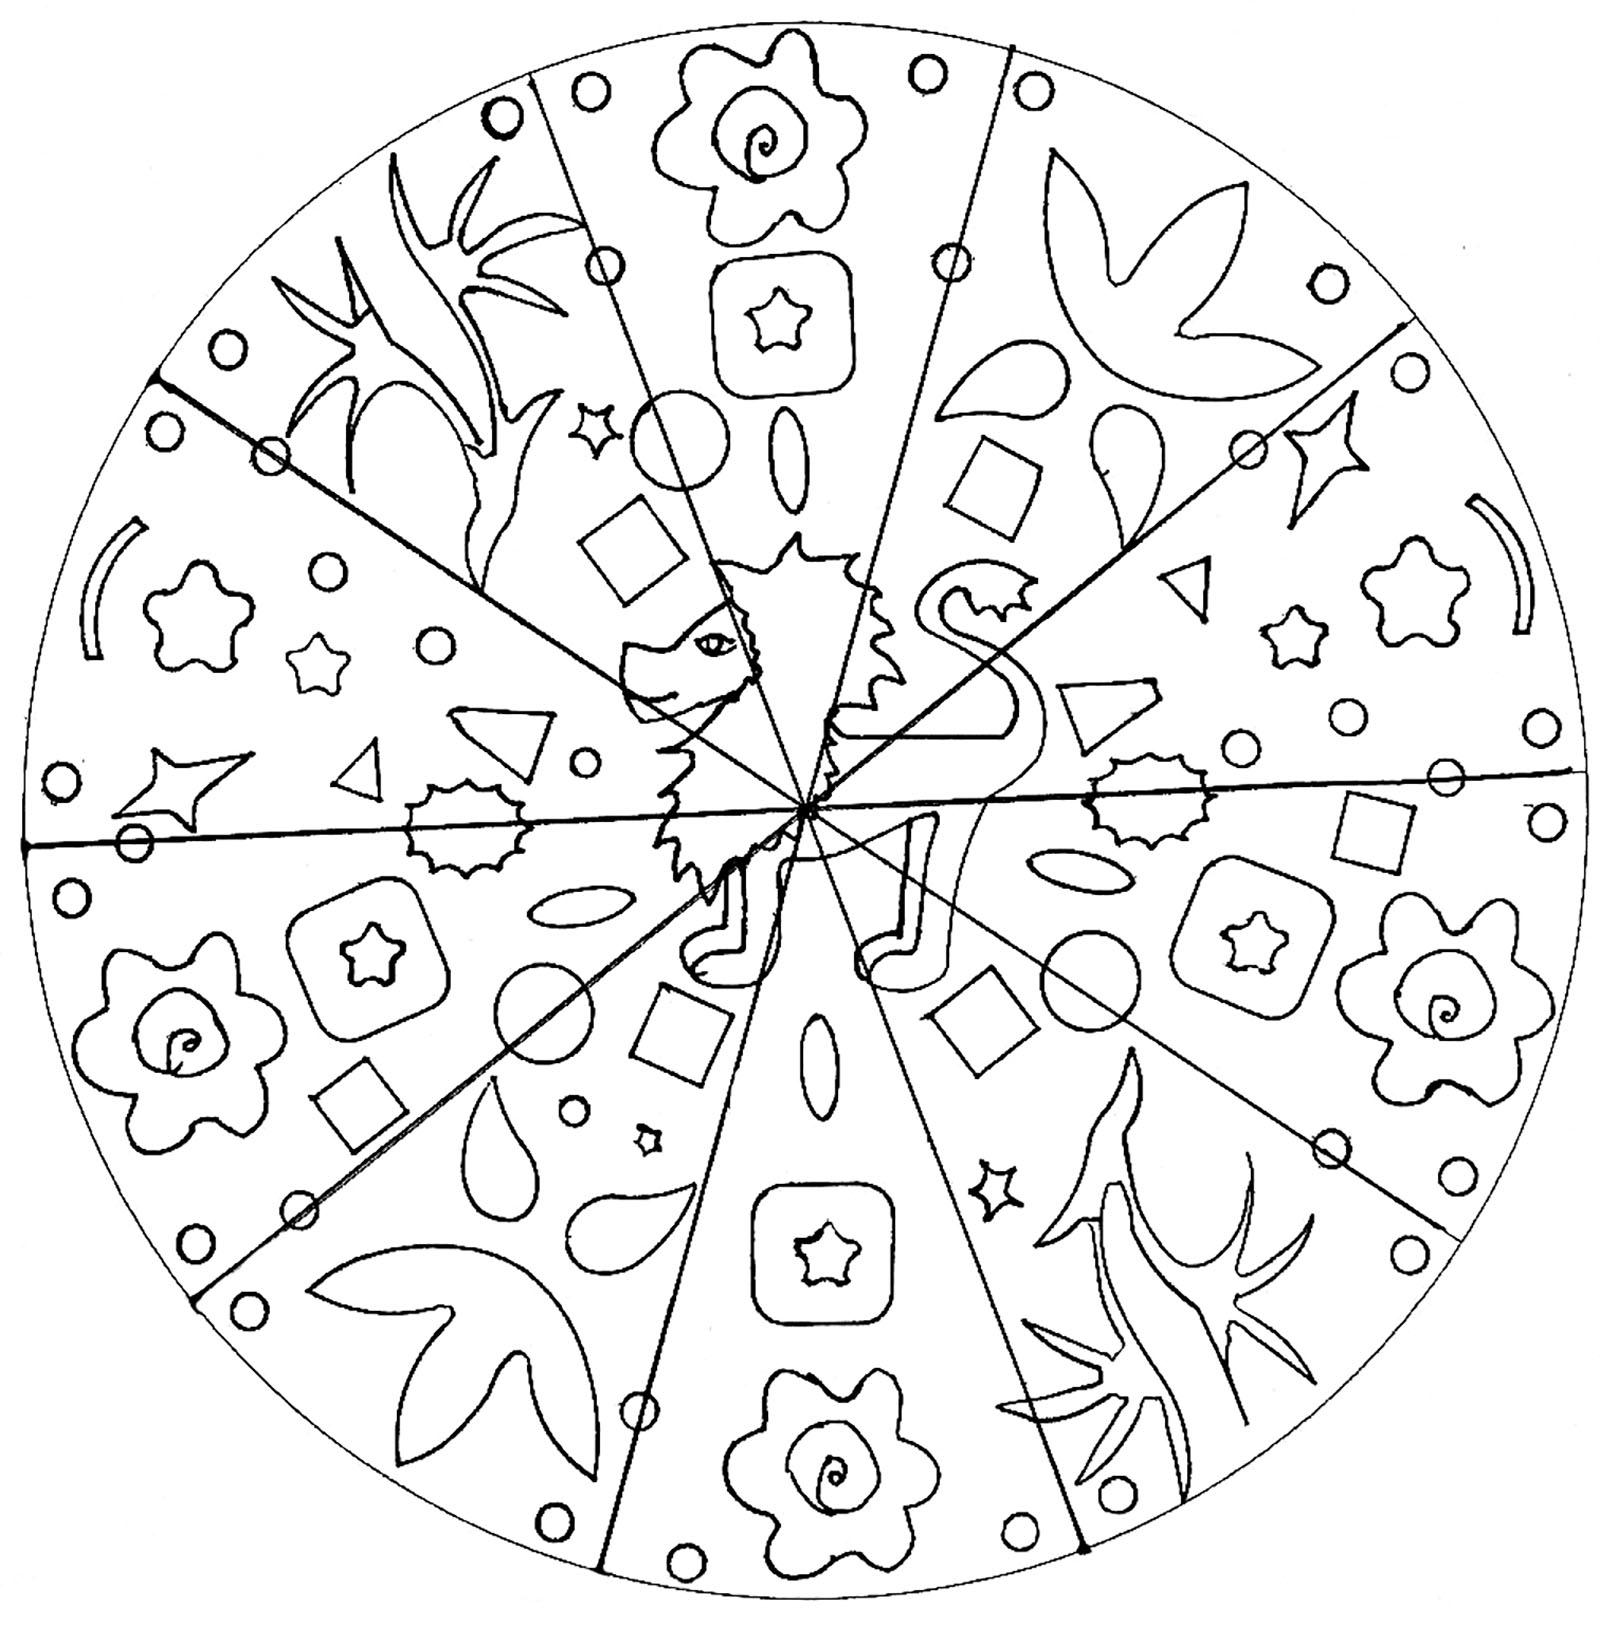 Simple Mandala For Kids With Lion Hand Drawn Easy Mandalas